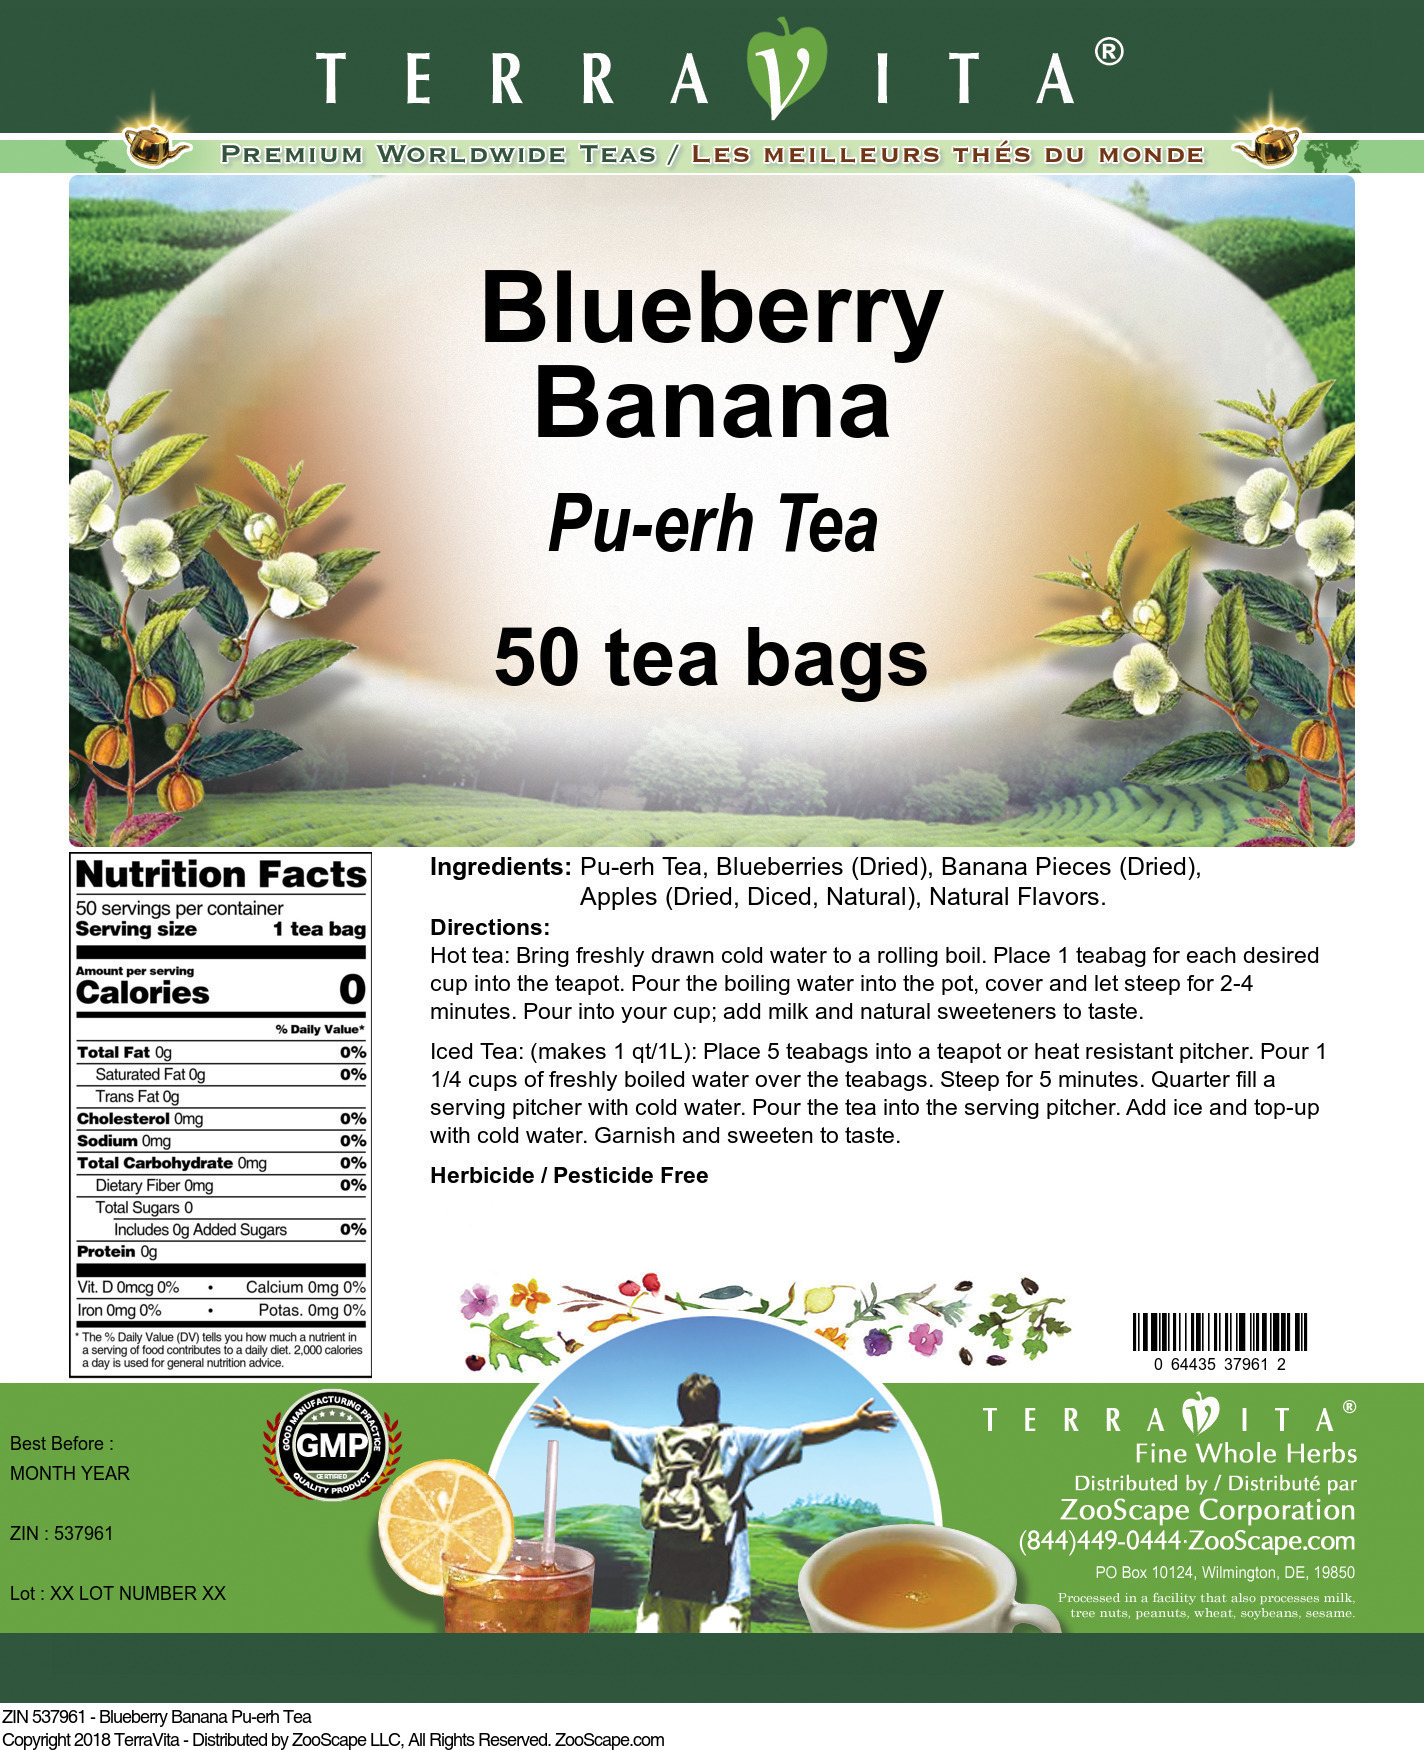 Blueberry Banana Pu-erh Tea